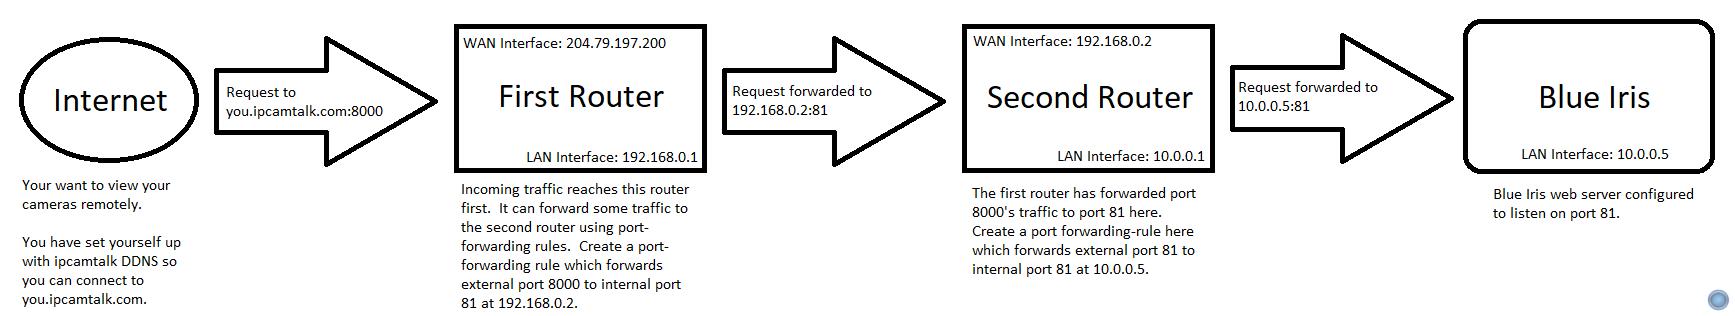 Double-NAT configuration for Blue Iris remote access | IP